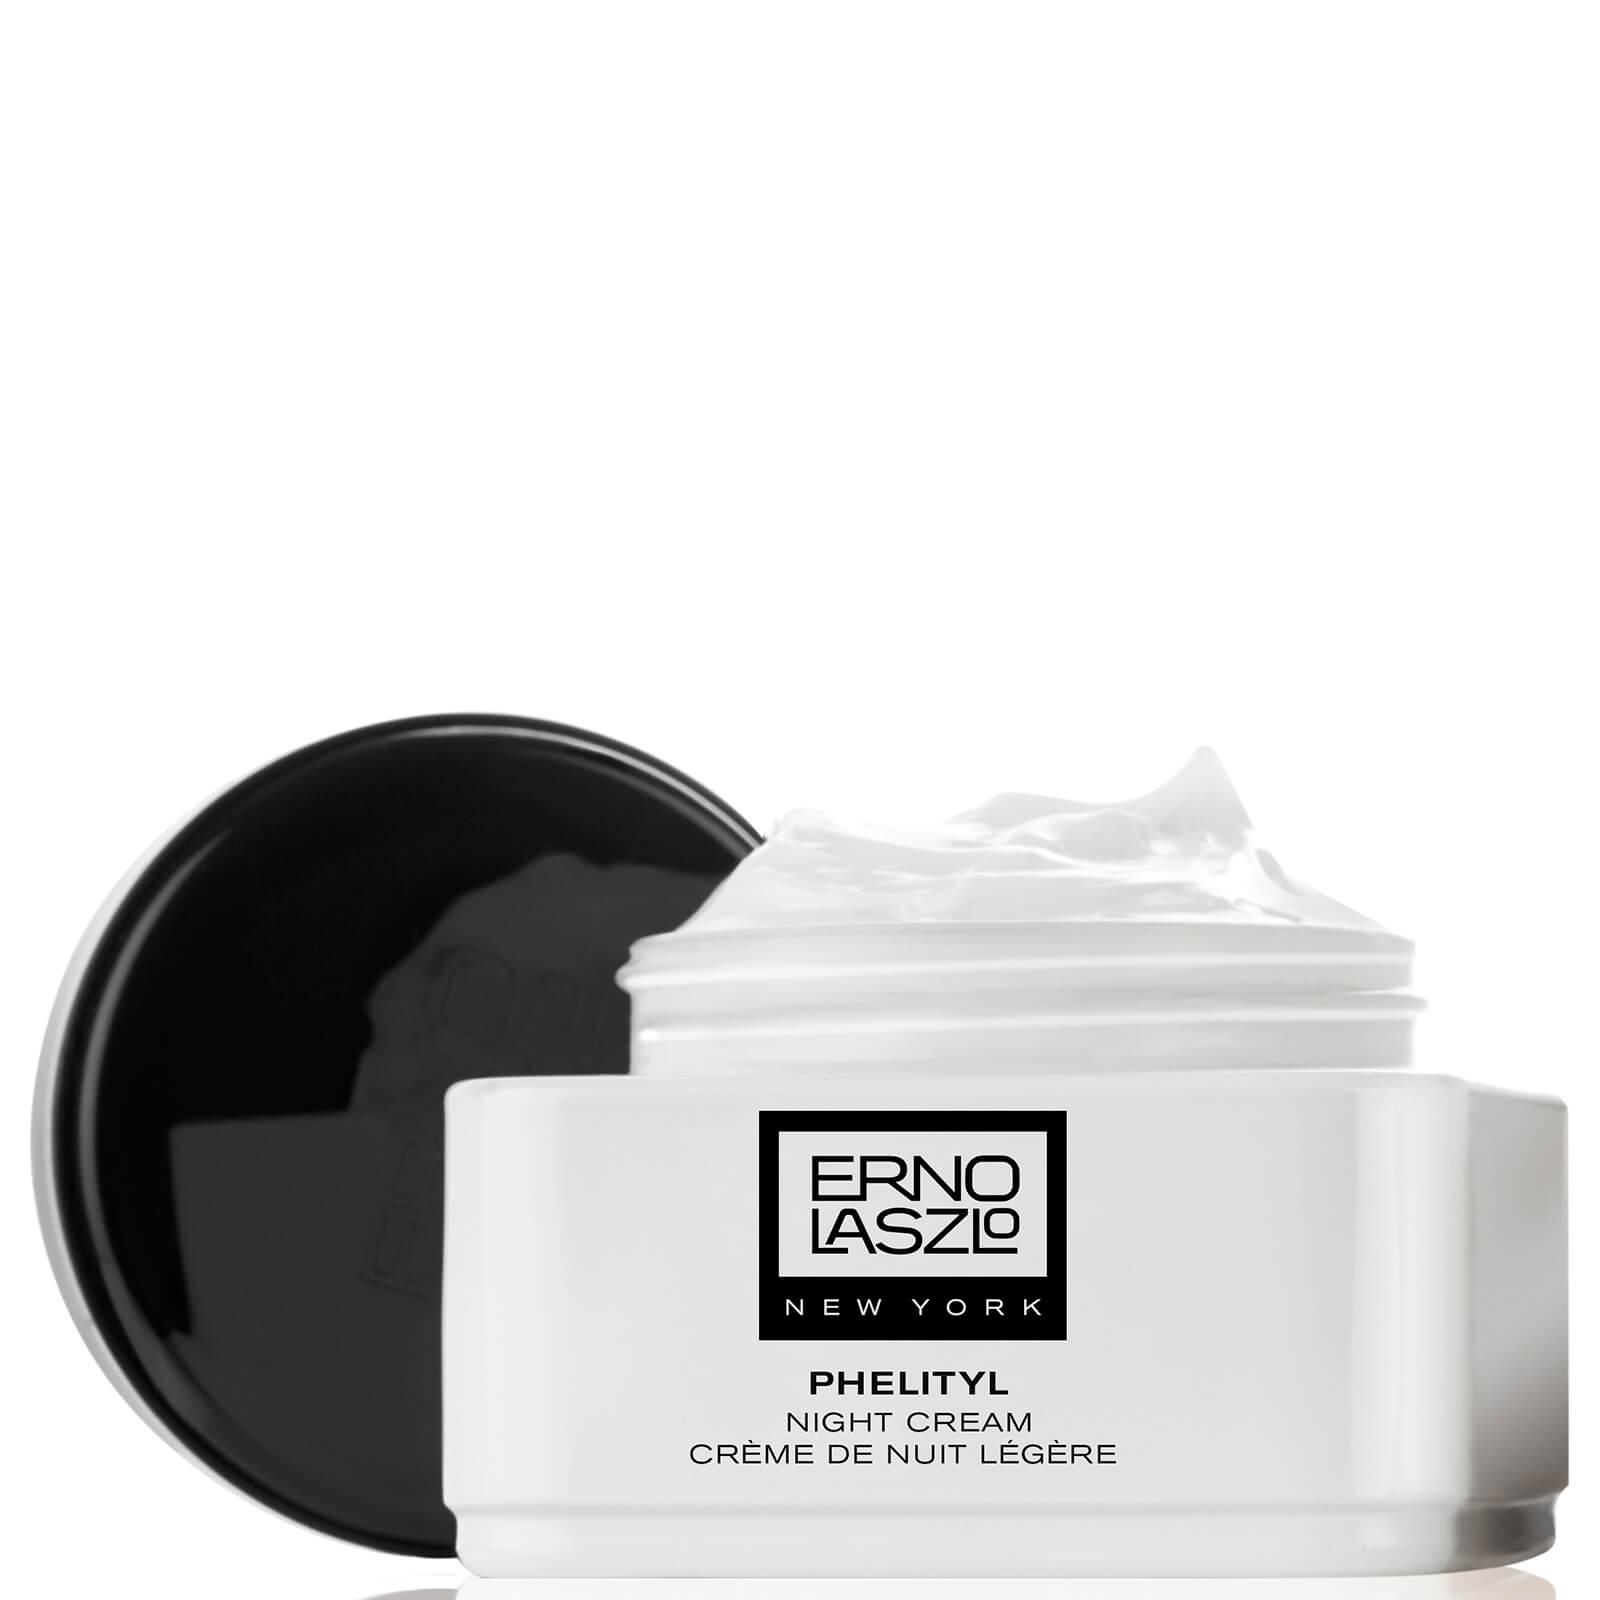 Erno Laszlo Phelityl Night Cream - 50ML